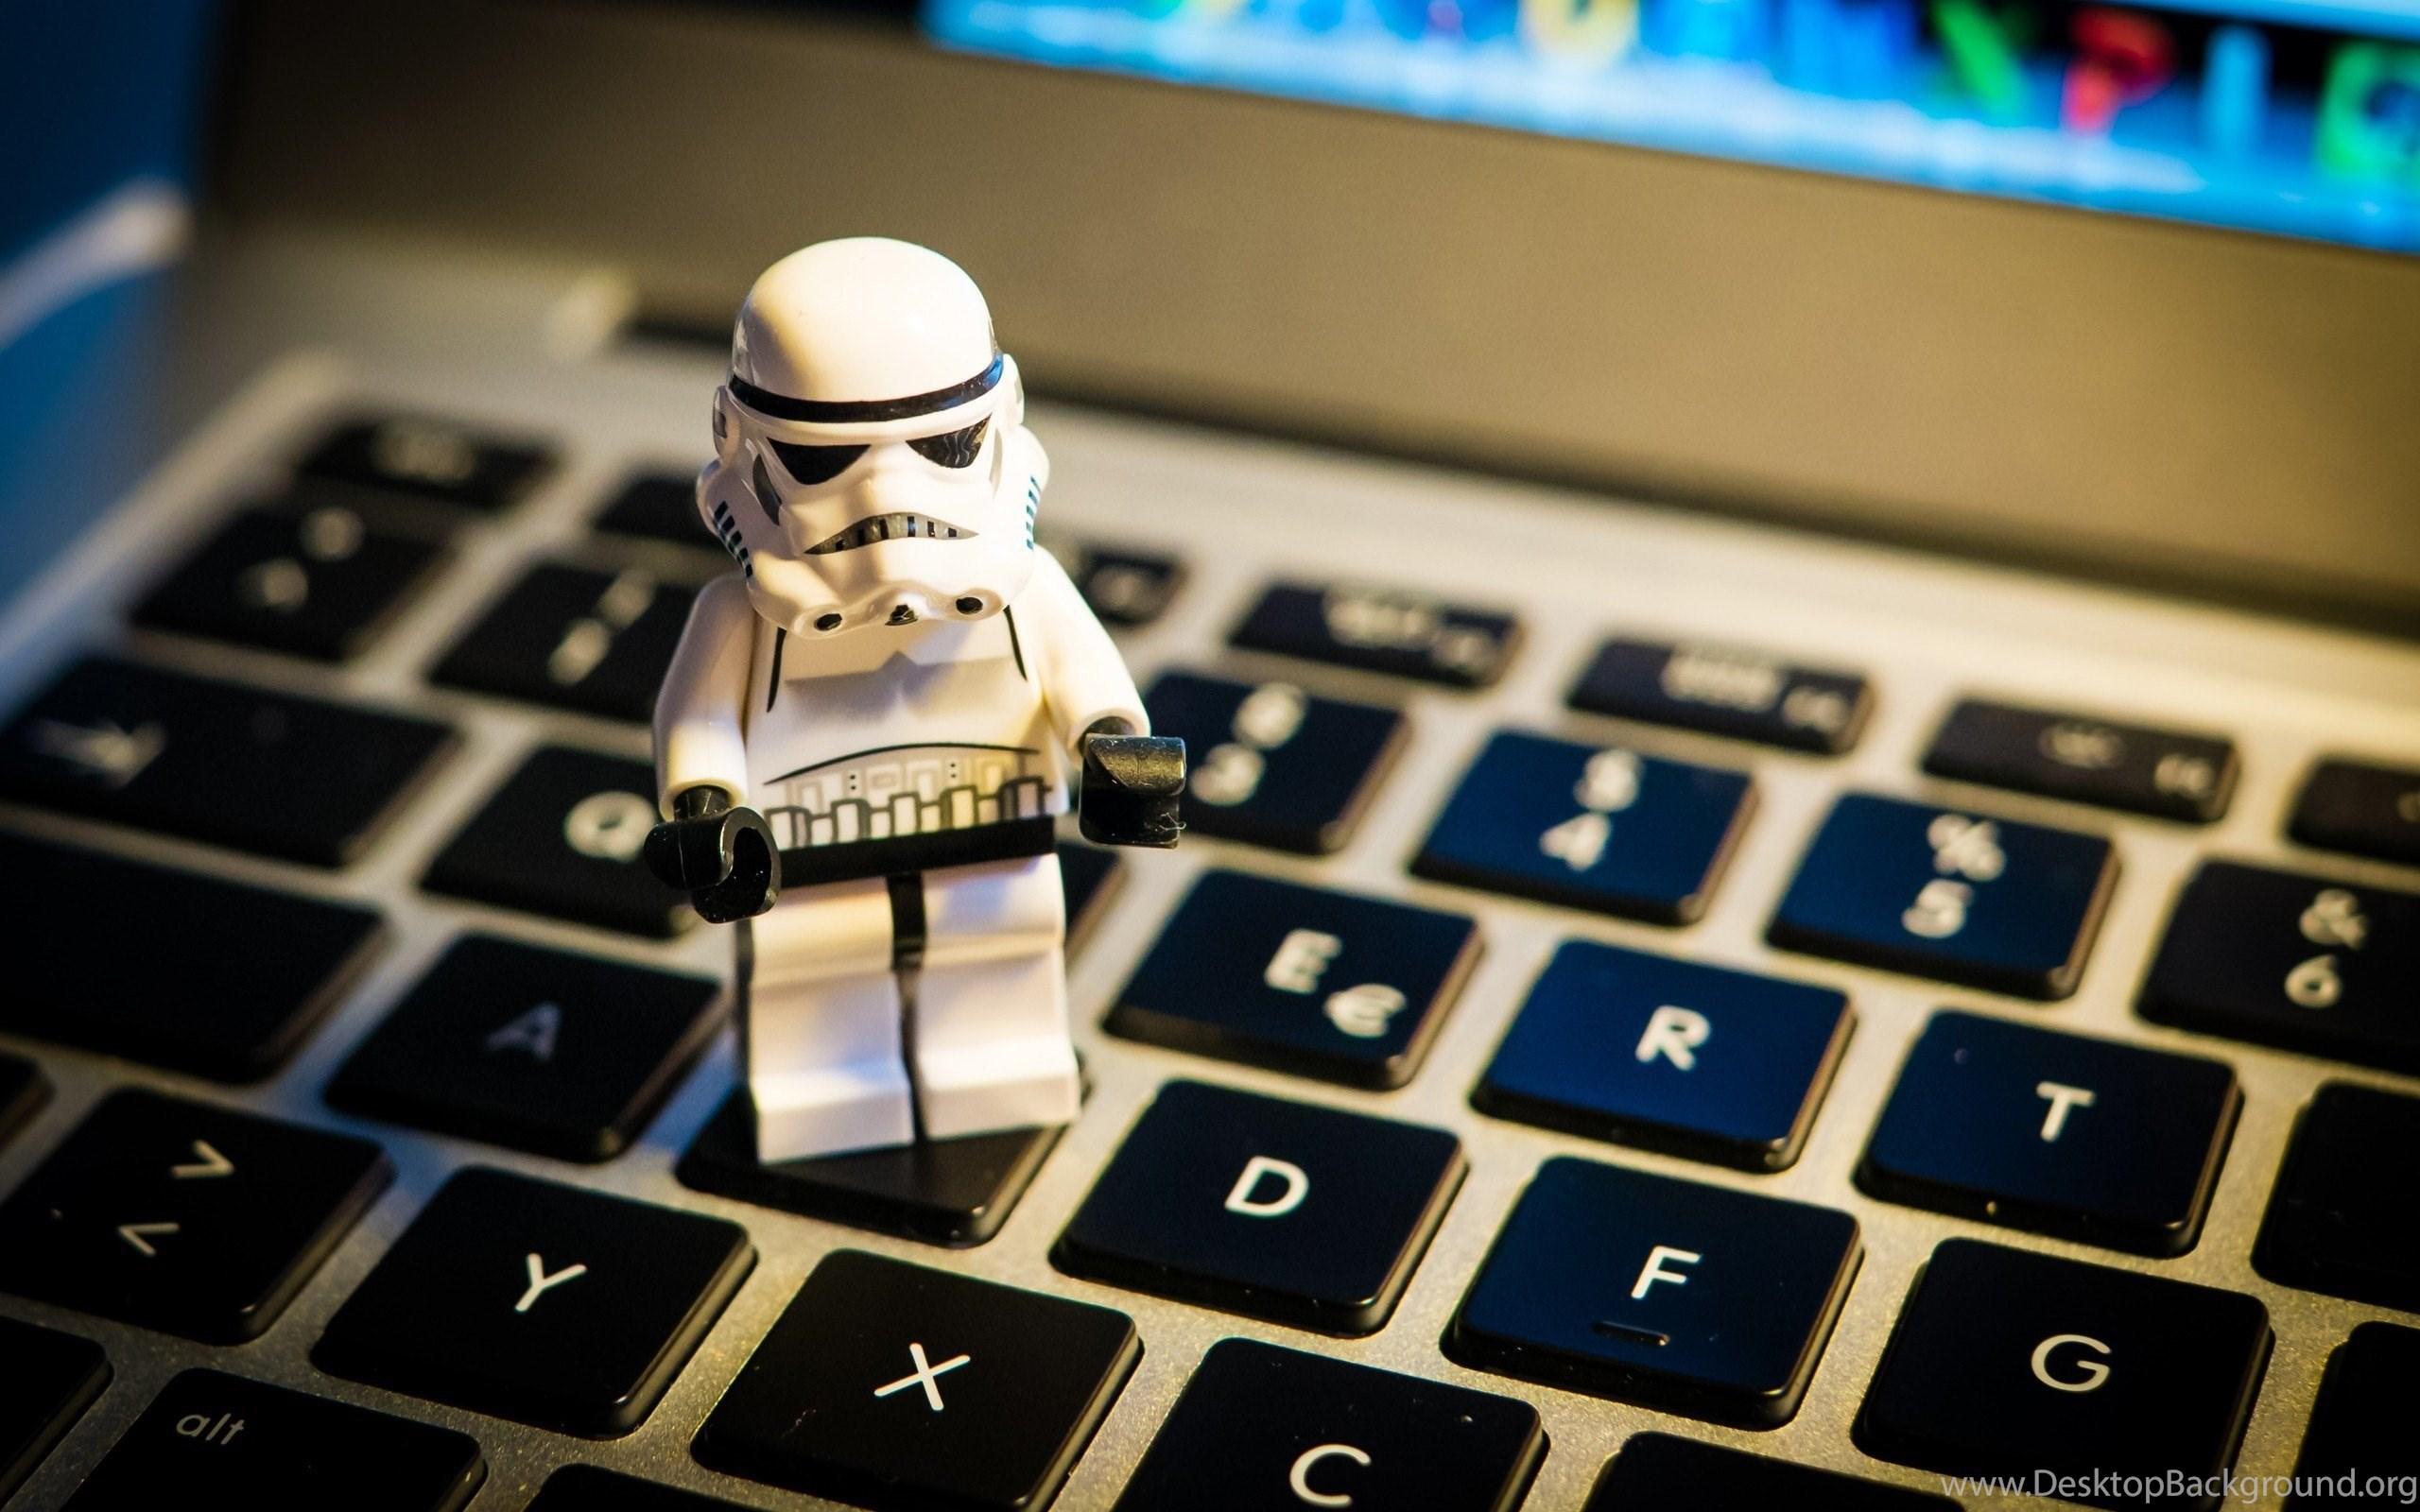 Stormtrooper Star Wars Lego Notebook Hd Wallpapers Desktop Background